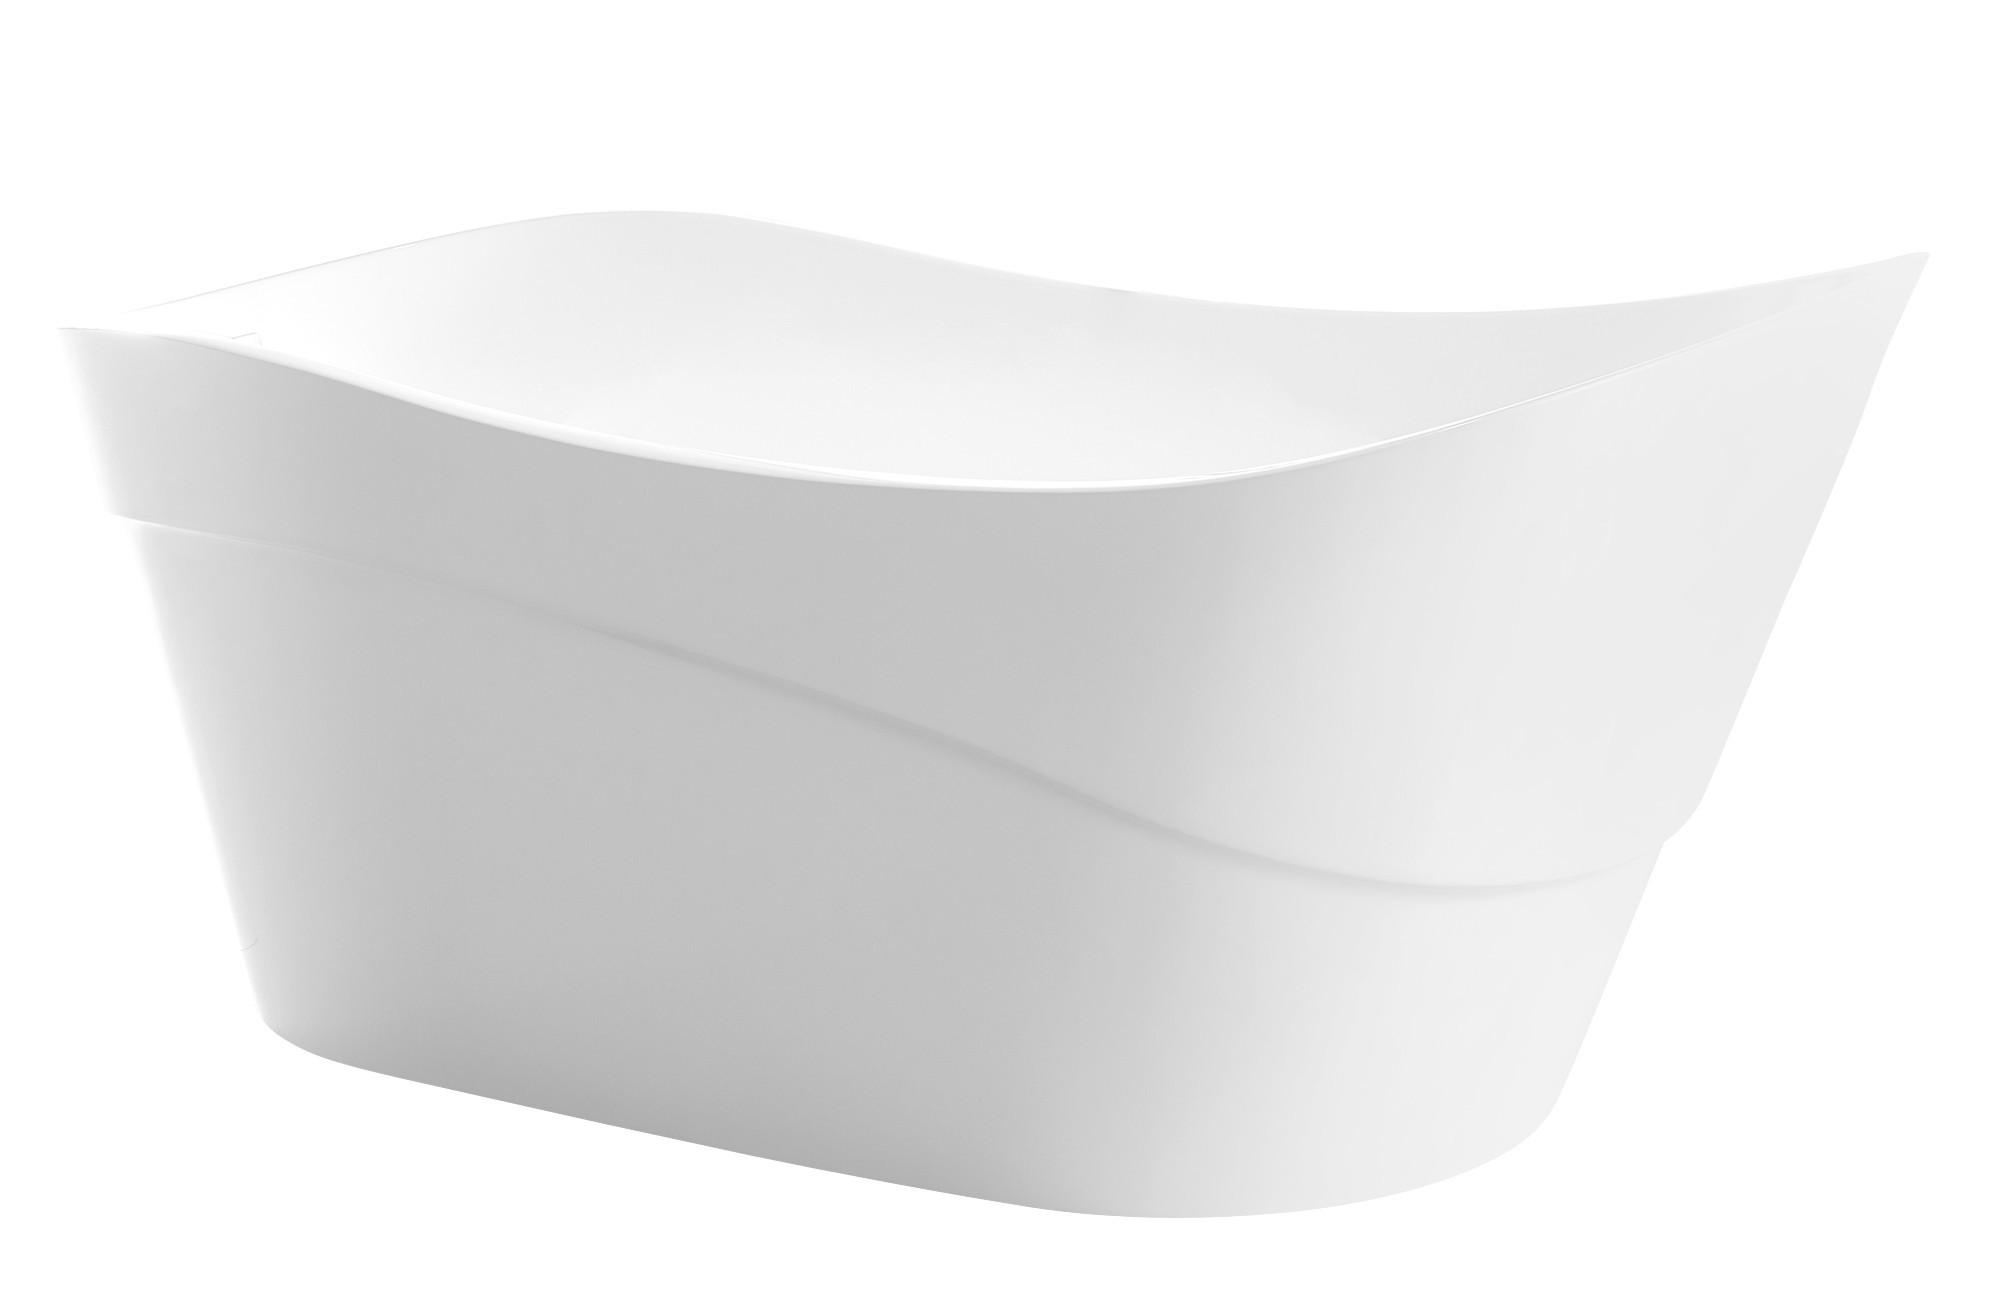 Anzzi FT-AZ094 Kahl Series 5.58 ft. Freestanding Bathtub in White